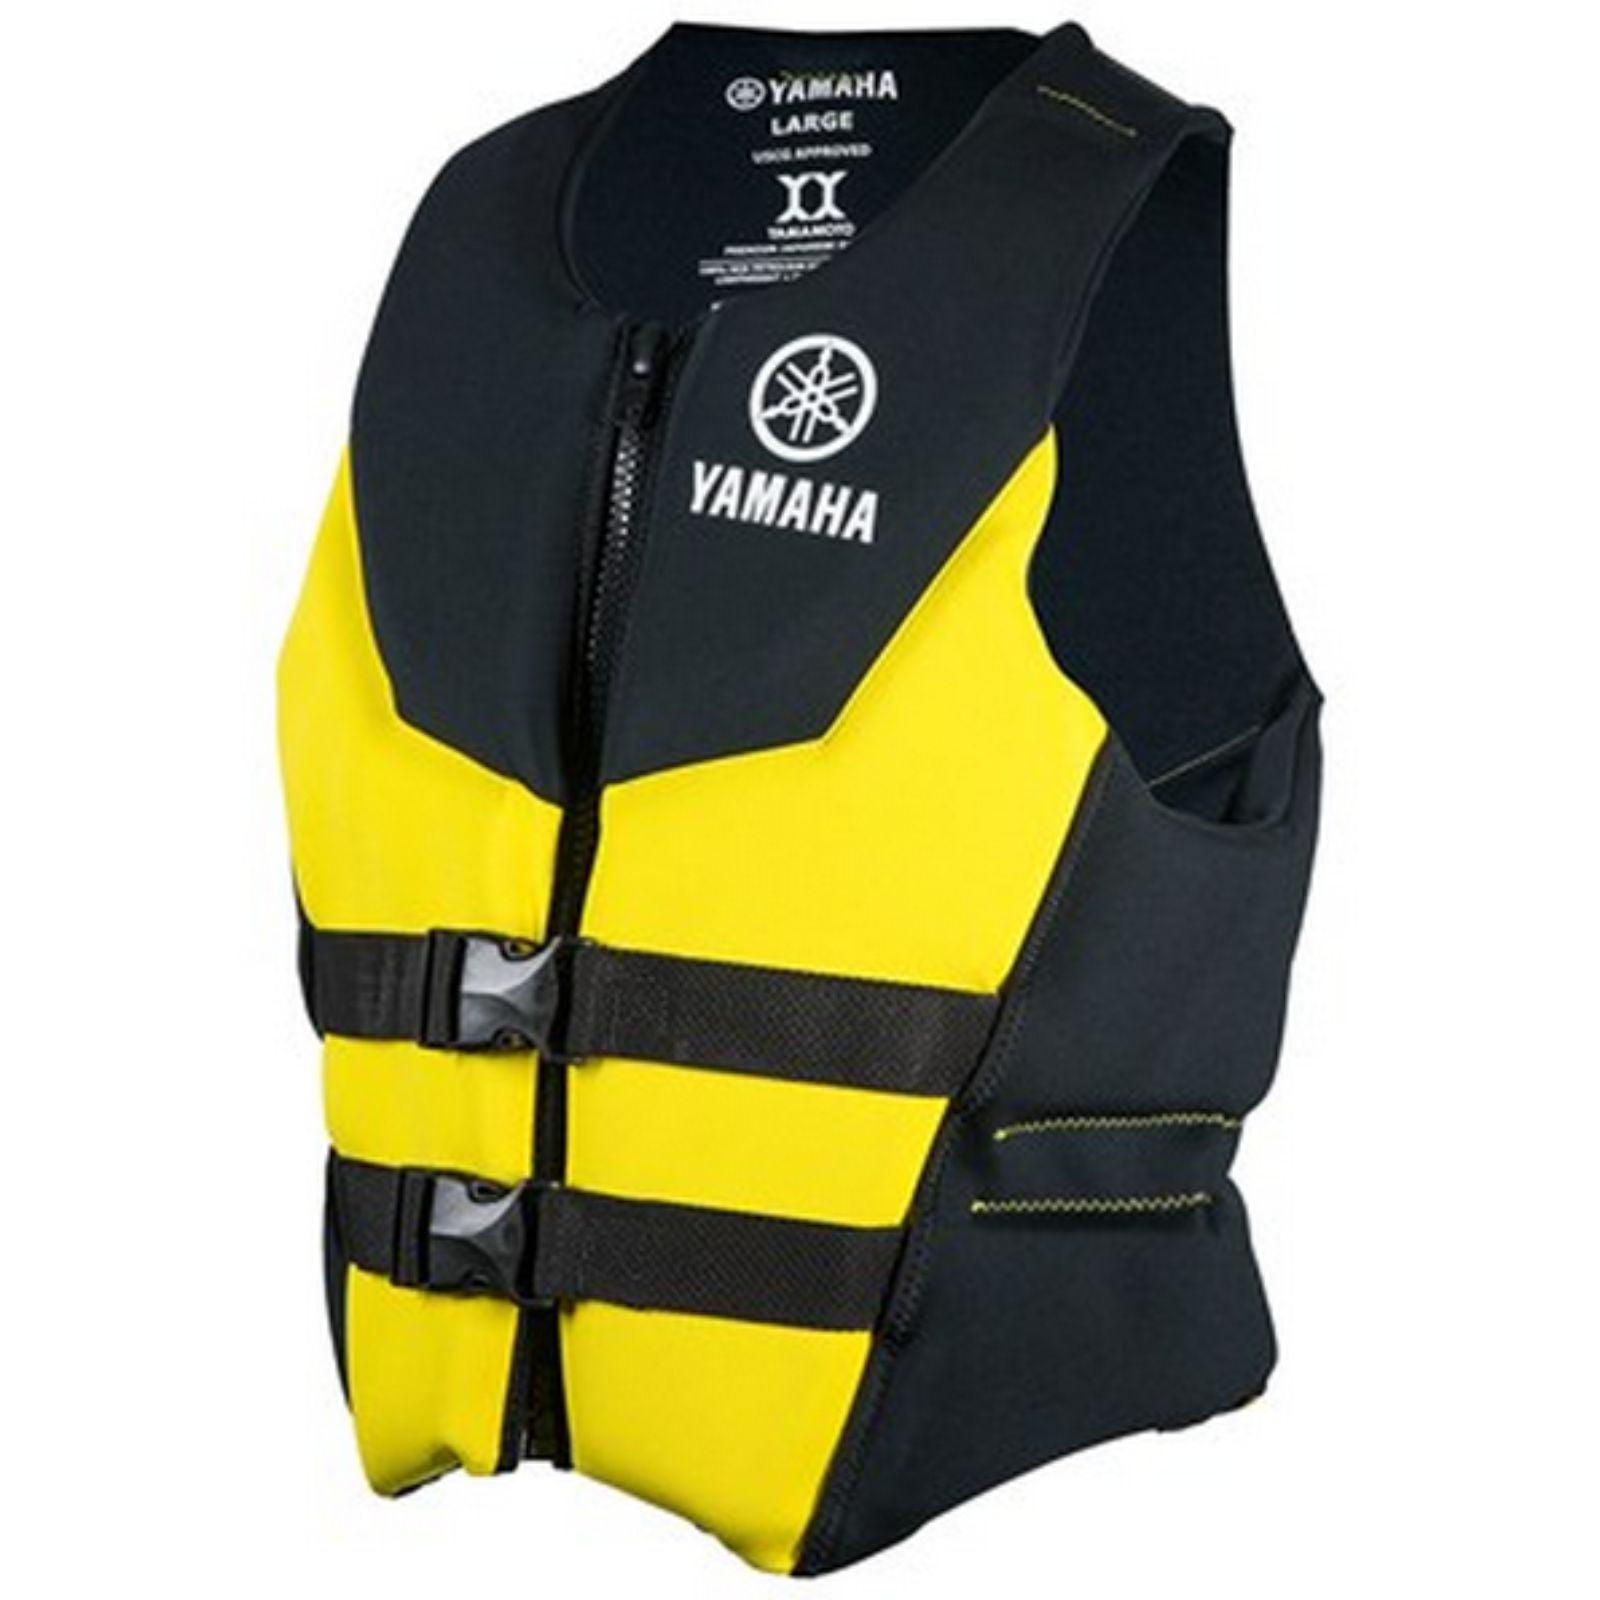 Oem Yamaha Men S Neoprene 2 Buckle Pfd Life Vest Jacket Walmart Com